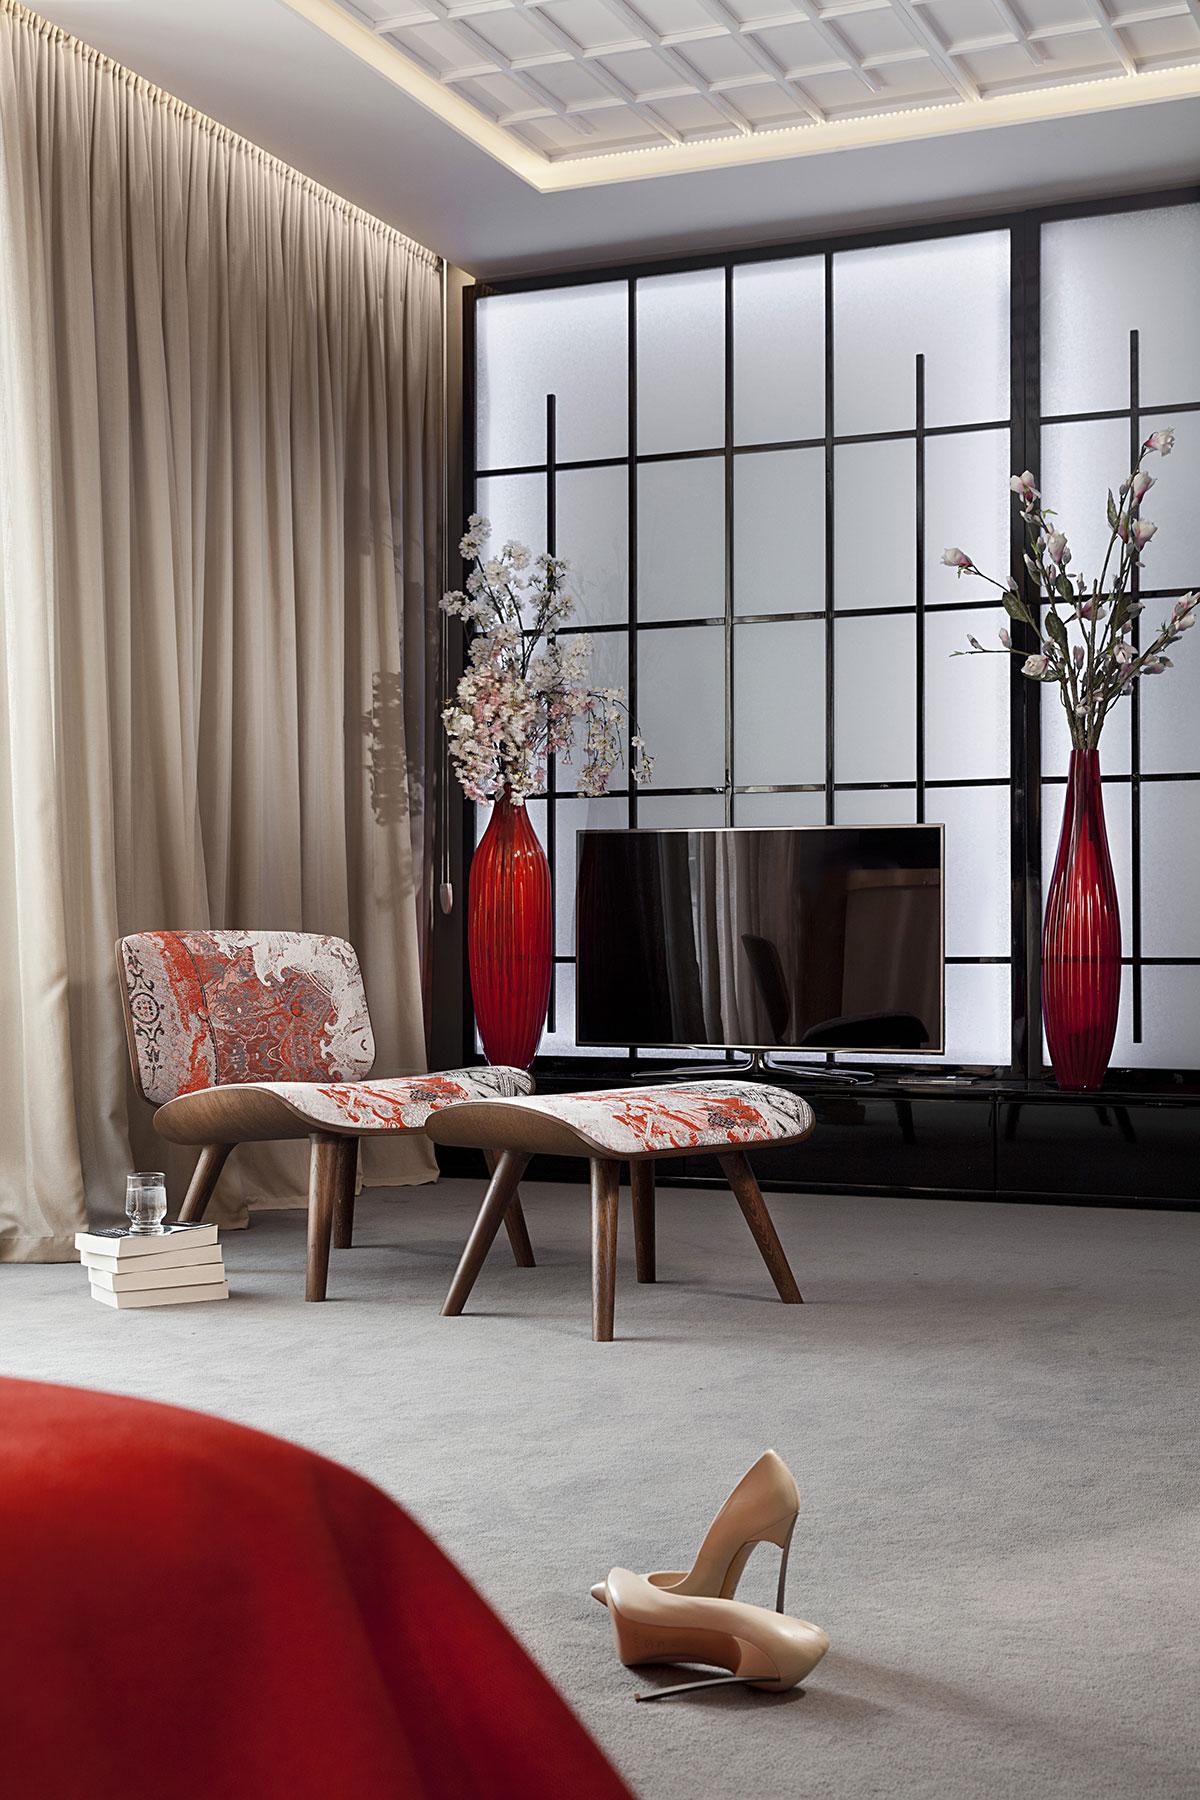 Japanese style home decor